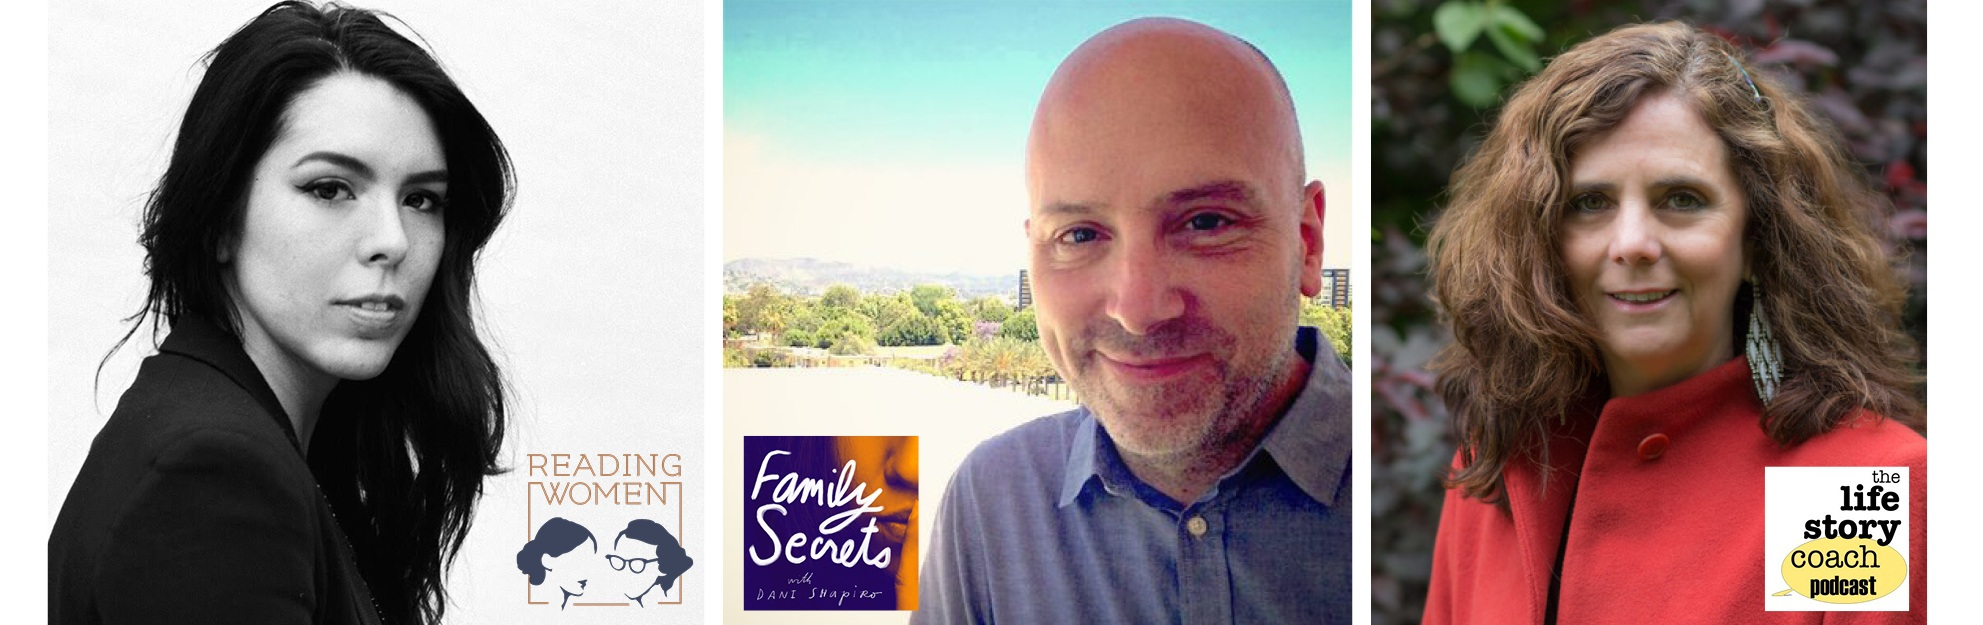 T Kira Madden, Steve Lickteig, Beth Kephart are recent podcast guests